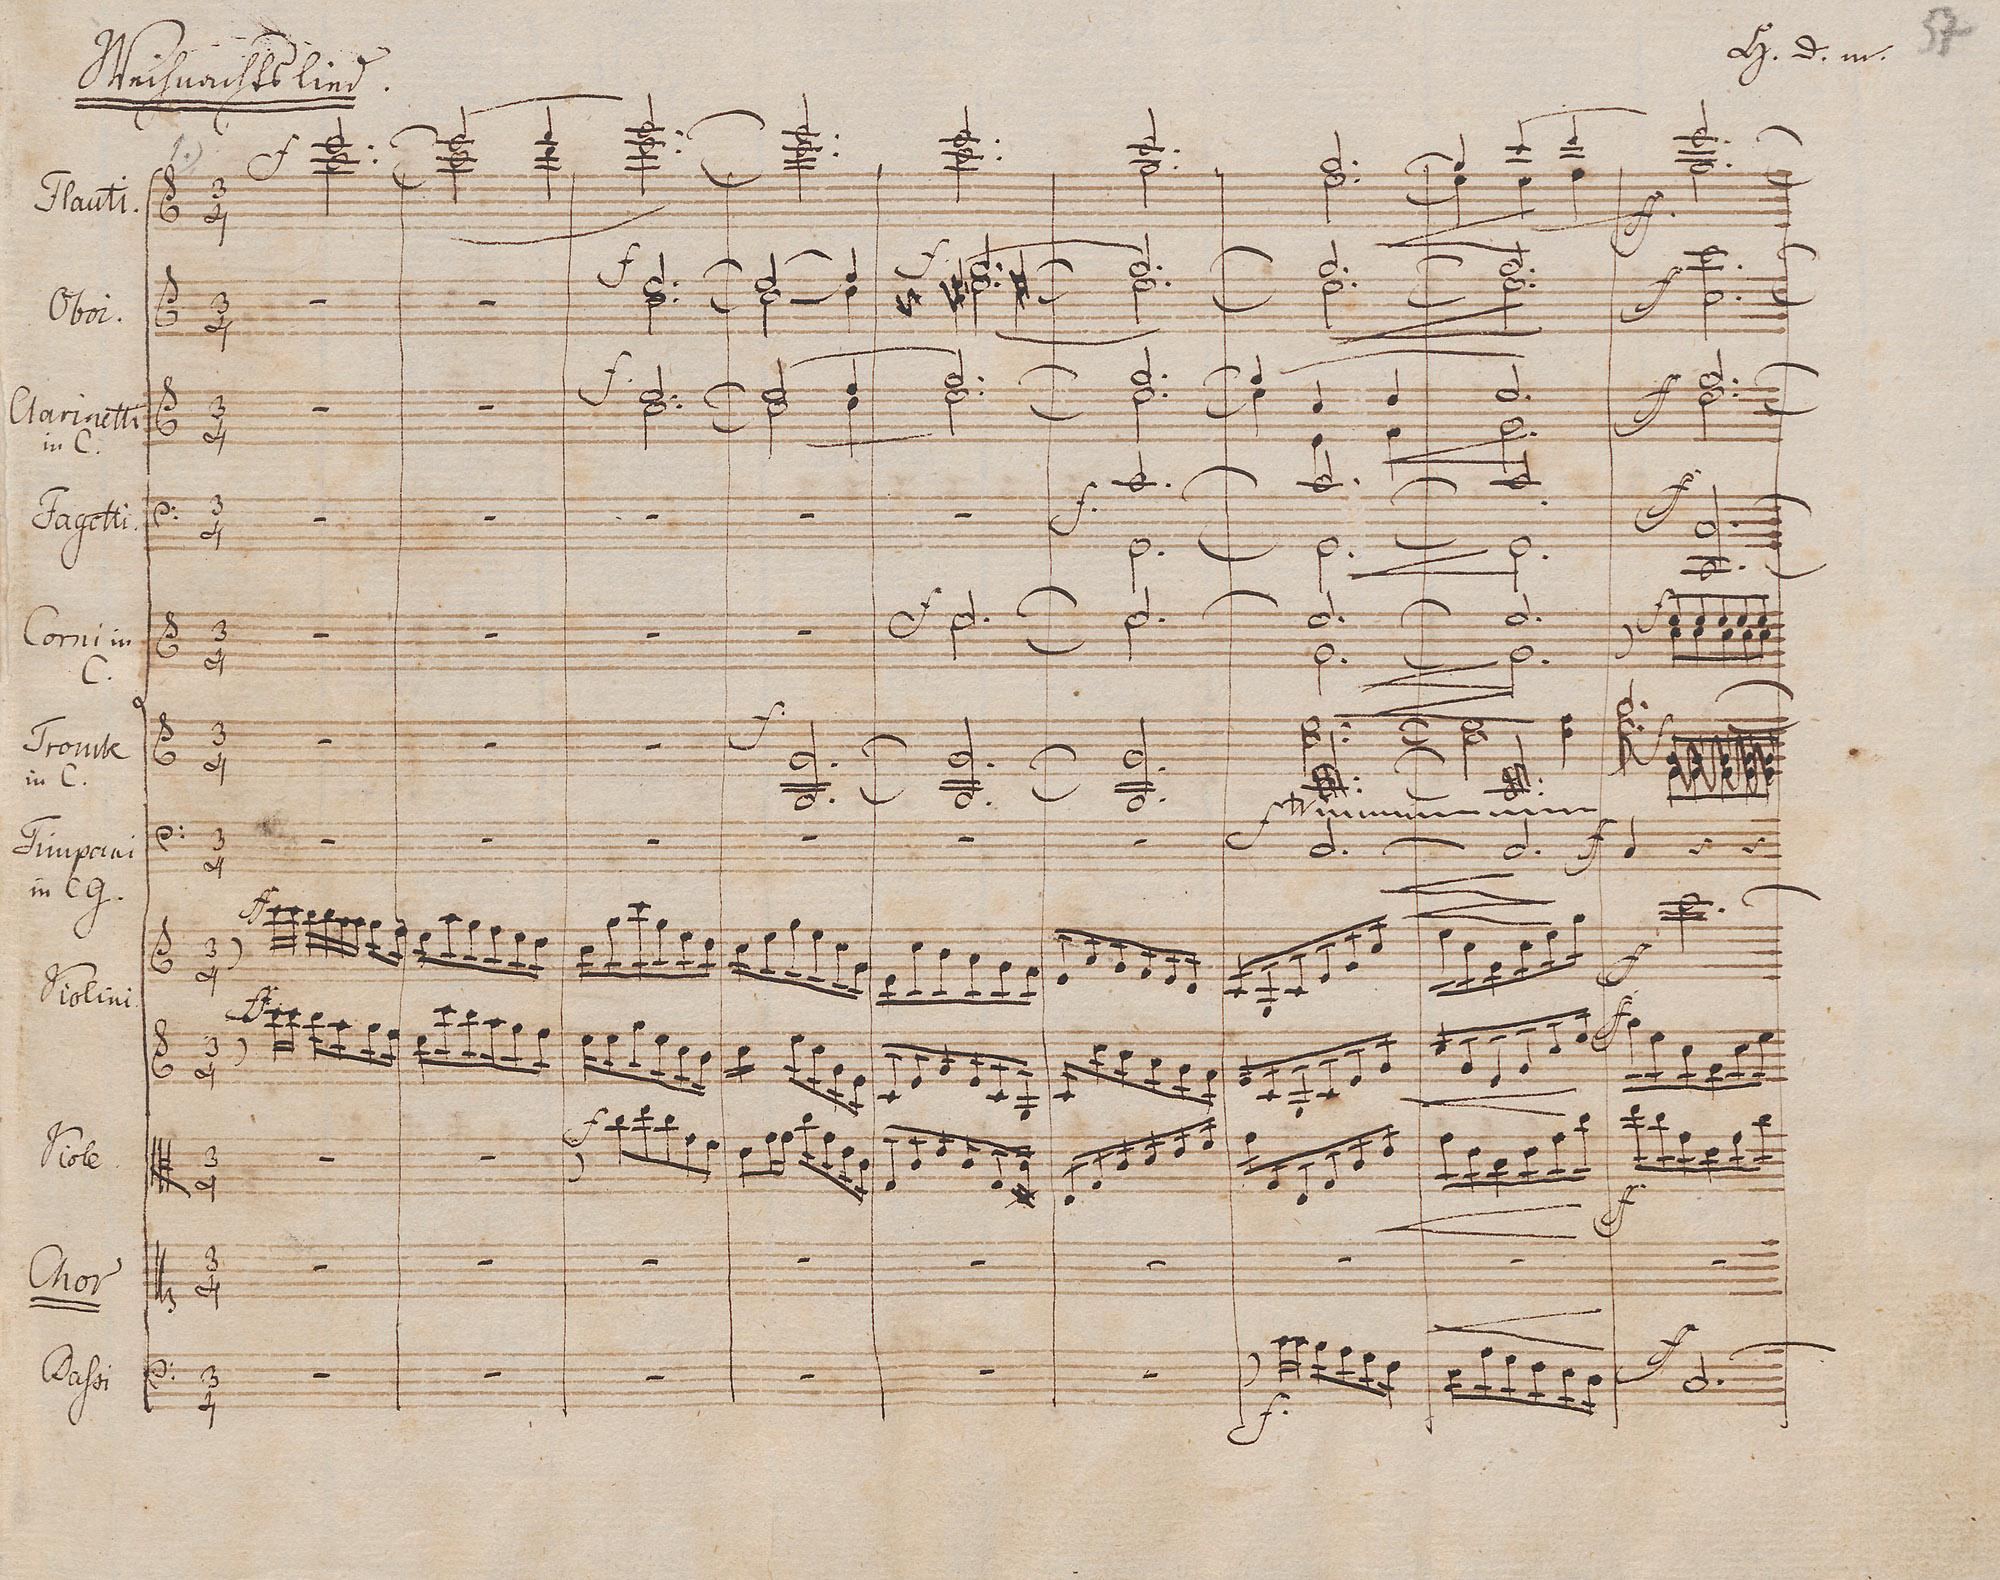 Felix Mendelssohn Bartholdy: Vom Himmel hoch da komm ich her MWV A 10. Autographe Partitur. Musikabteilung. Lizenz: CC-BY-NC-SA